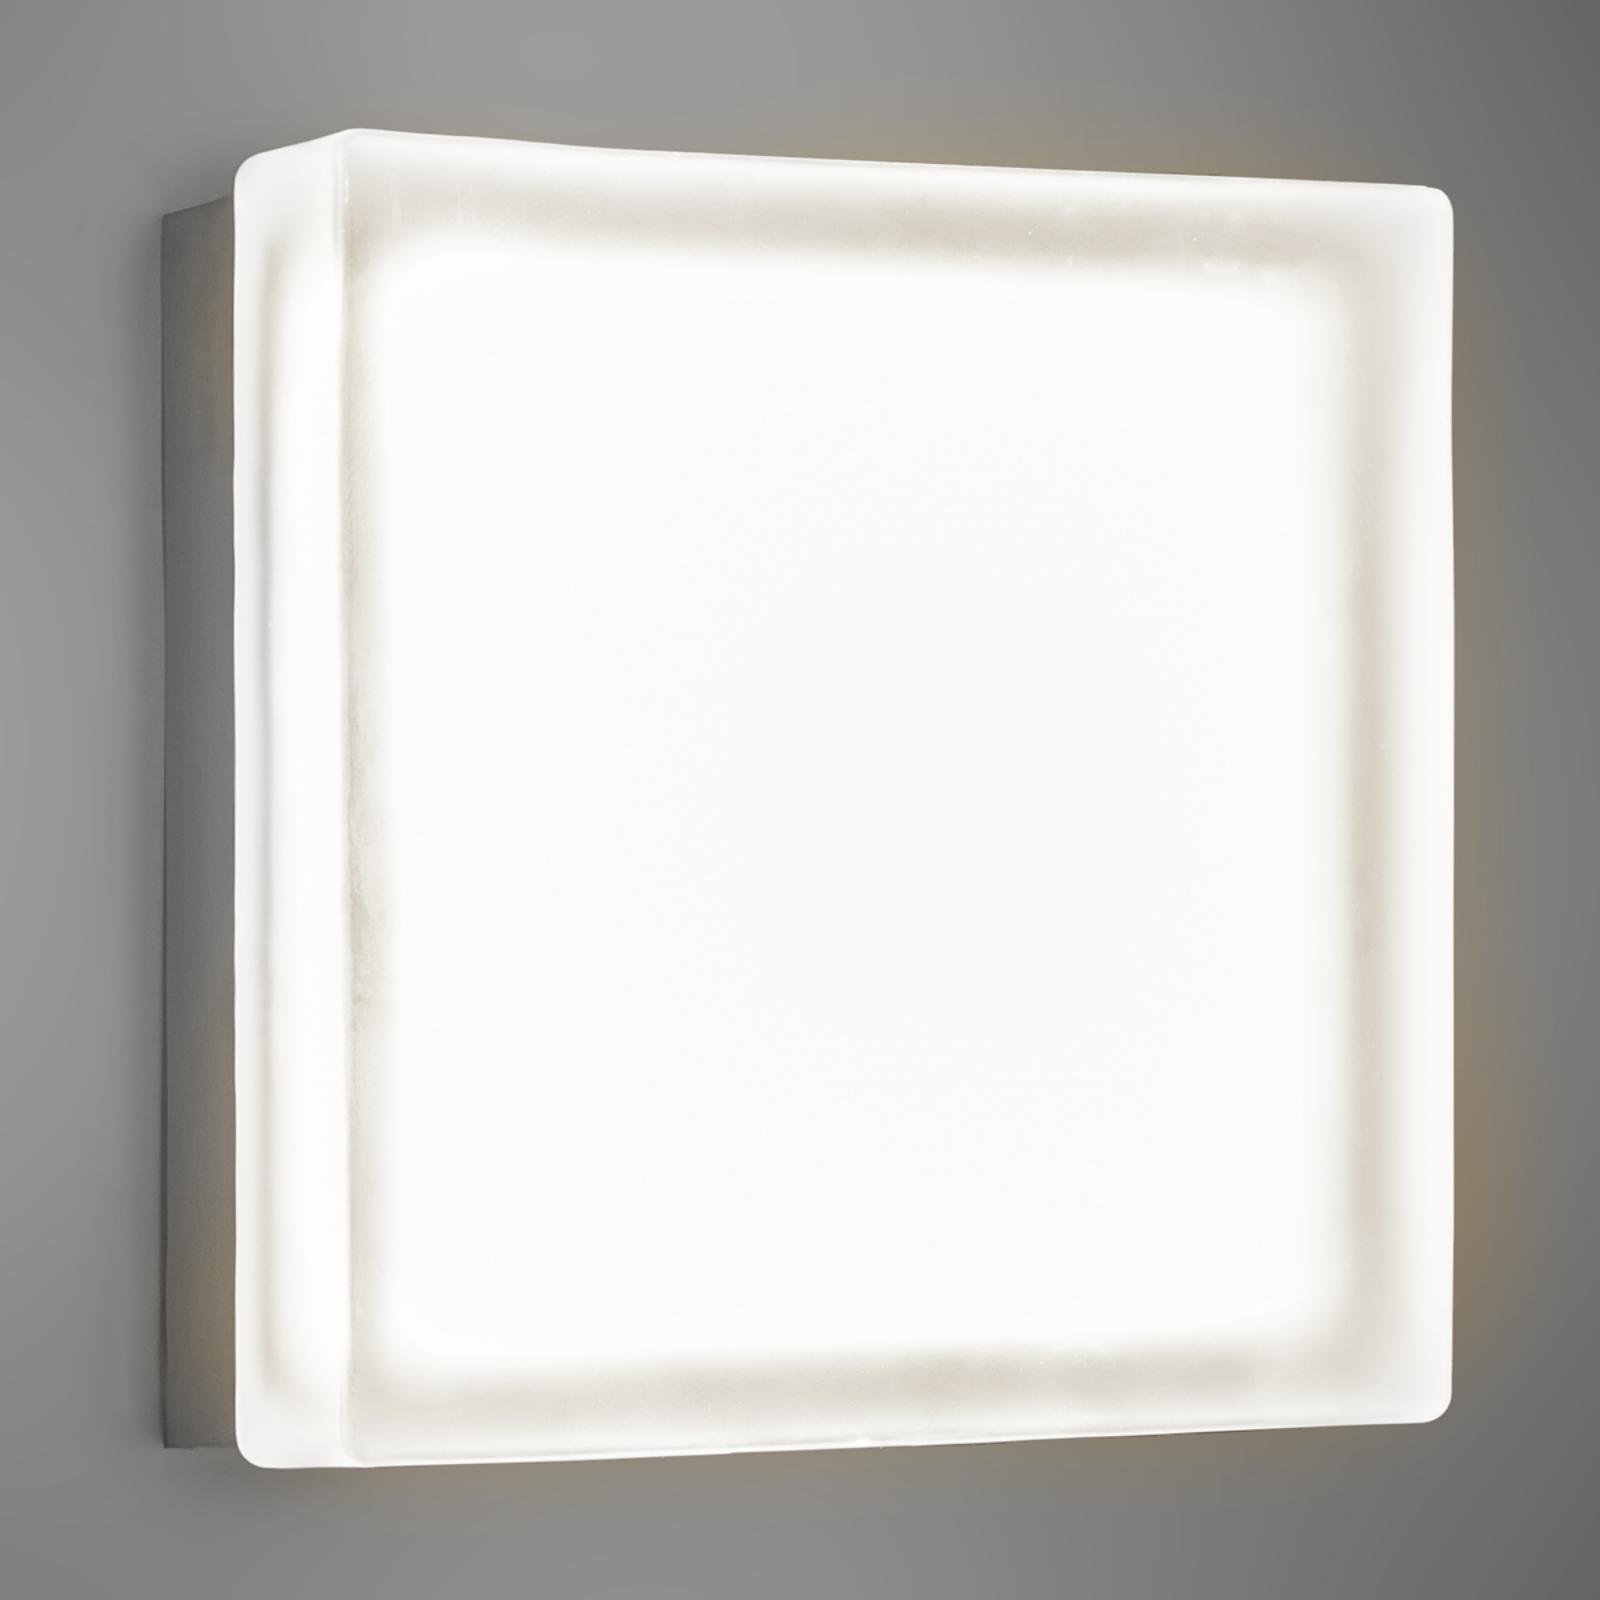 Quadratische LED-Wandleuchte Briq 02 warmweiß